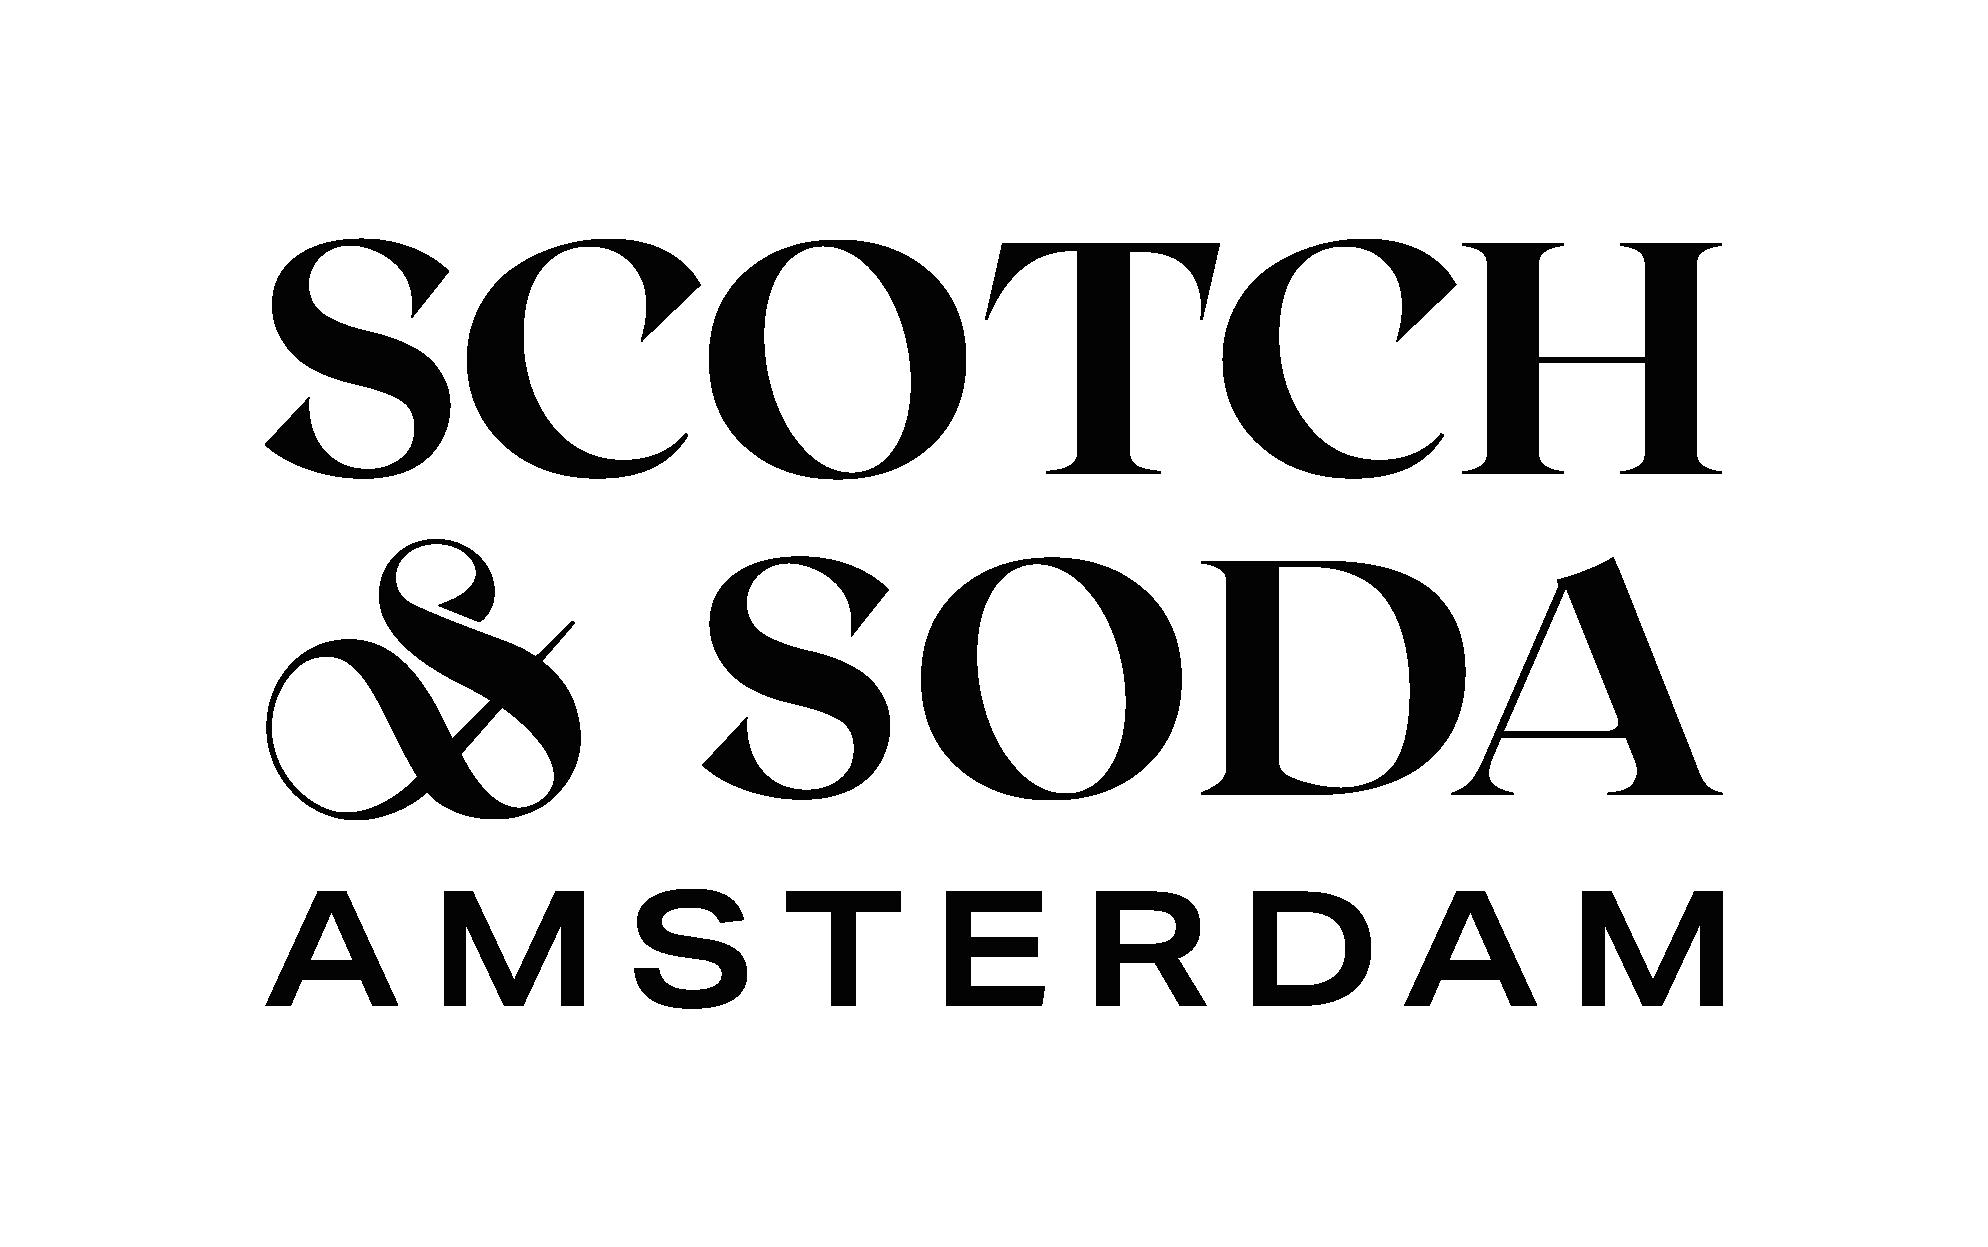 SCOTCH & SODA (スコッチ アンド ソーダ)